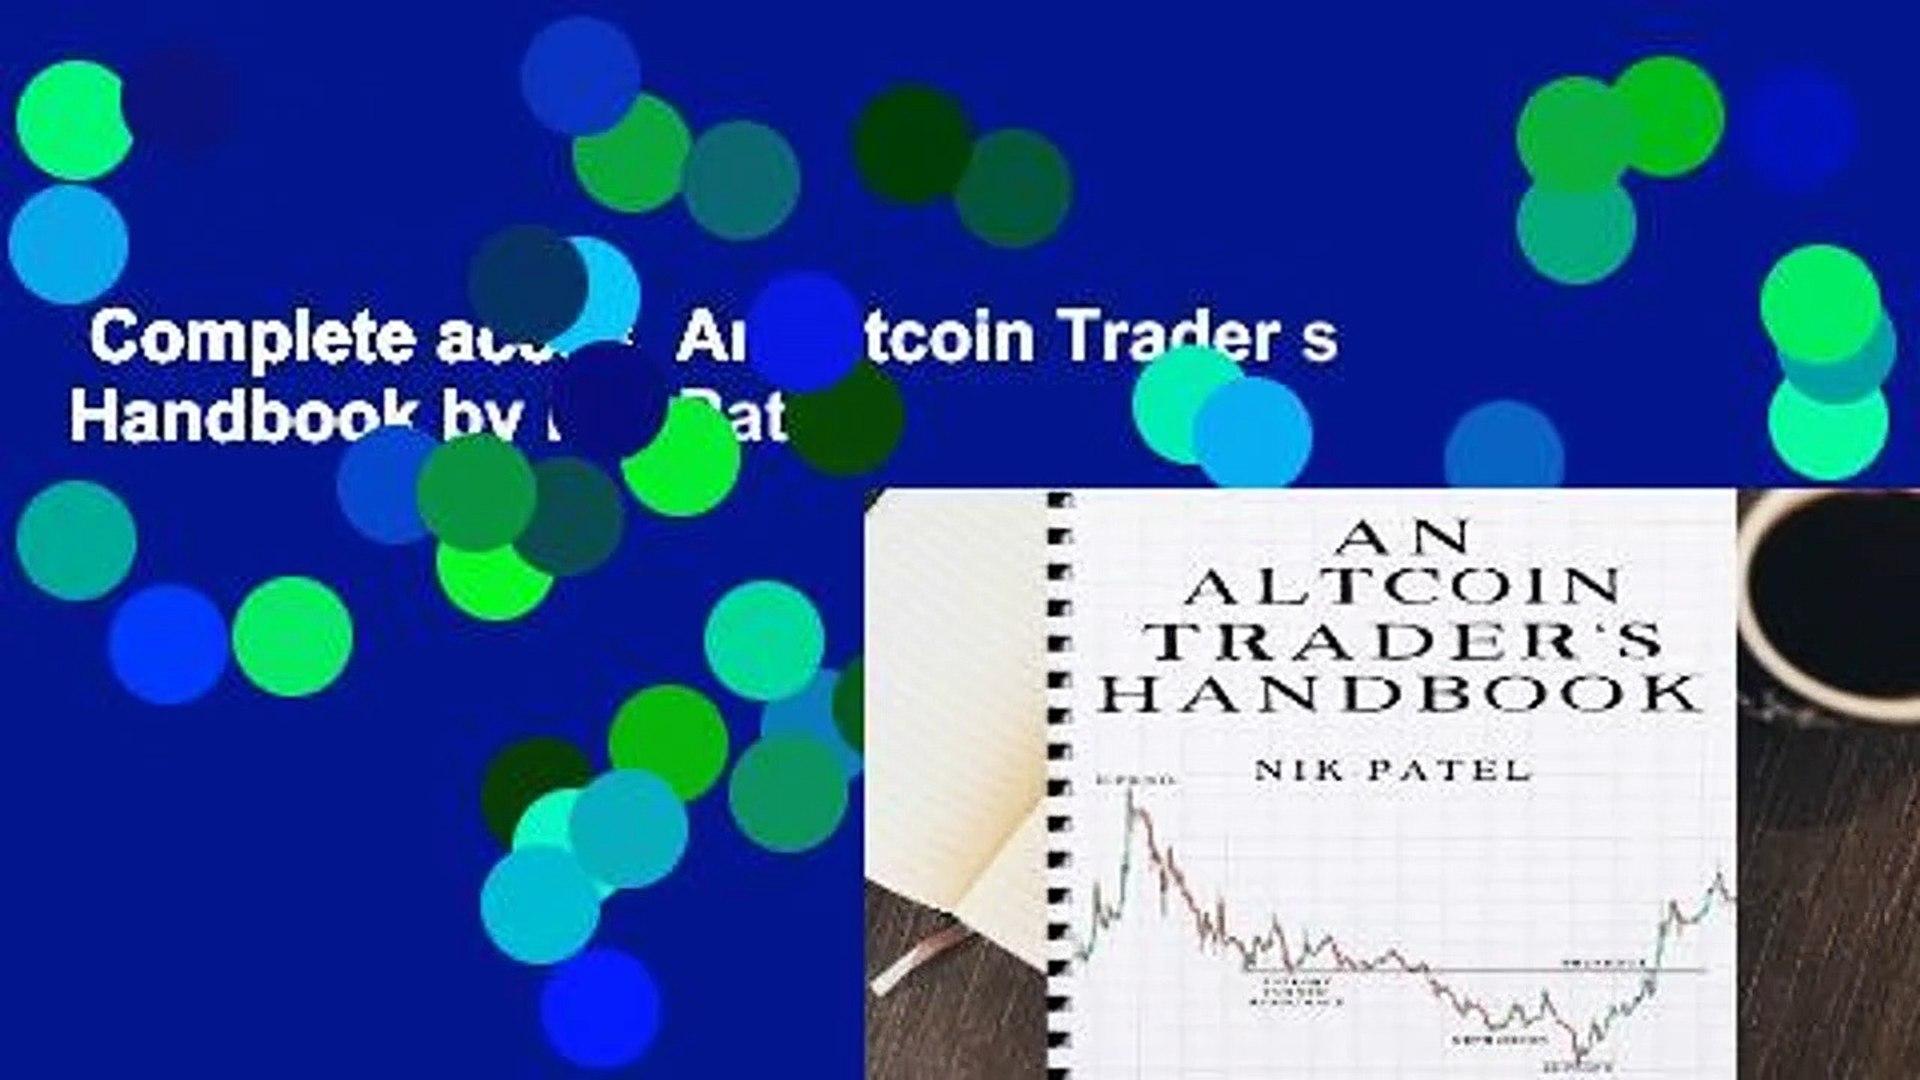 Altcoin Trader complete acces an altcoin trader s handbooknik patel